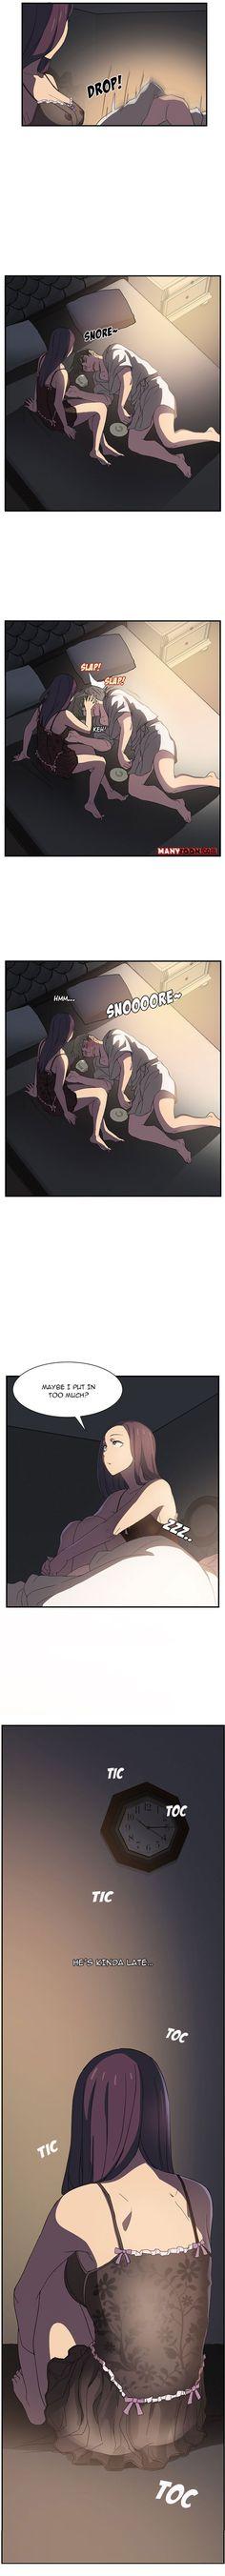 My Stepmom - Adult Comics - Brand new series, Fast loading speed, Fast update - ManyToon - Read Adult Comics Free Online Comics Pdf, Read Comics, My Step Mom, Married Woman, 10 Year Old, Webtoon, Manhwa, Romance, Free